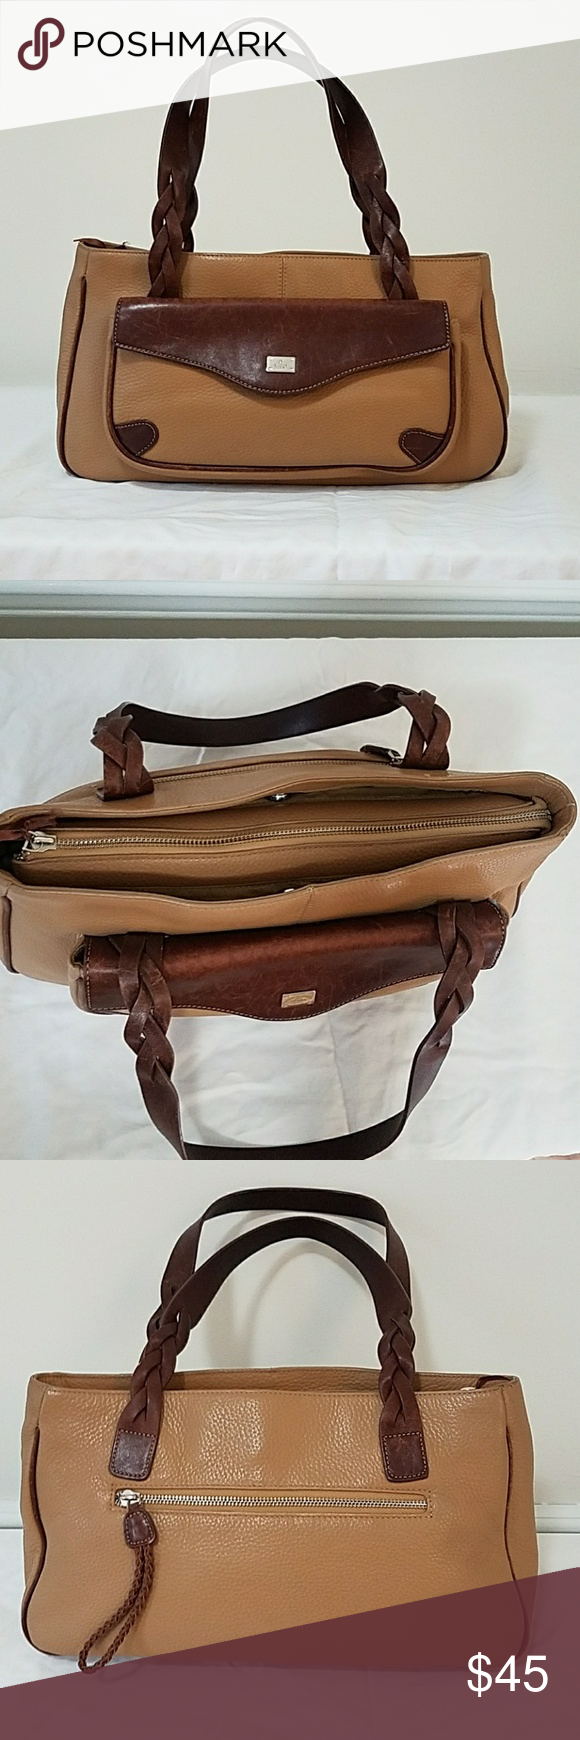 abb51e9c54 GILLIAN Elegant Italian leather Satchel TAN pebbled leather and Brown  Leather Satchel with braided straps.